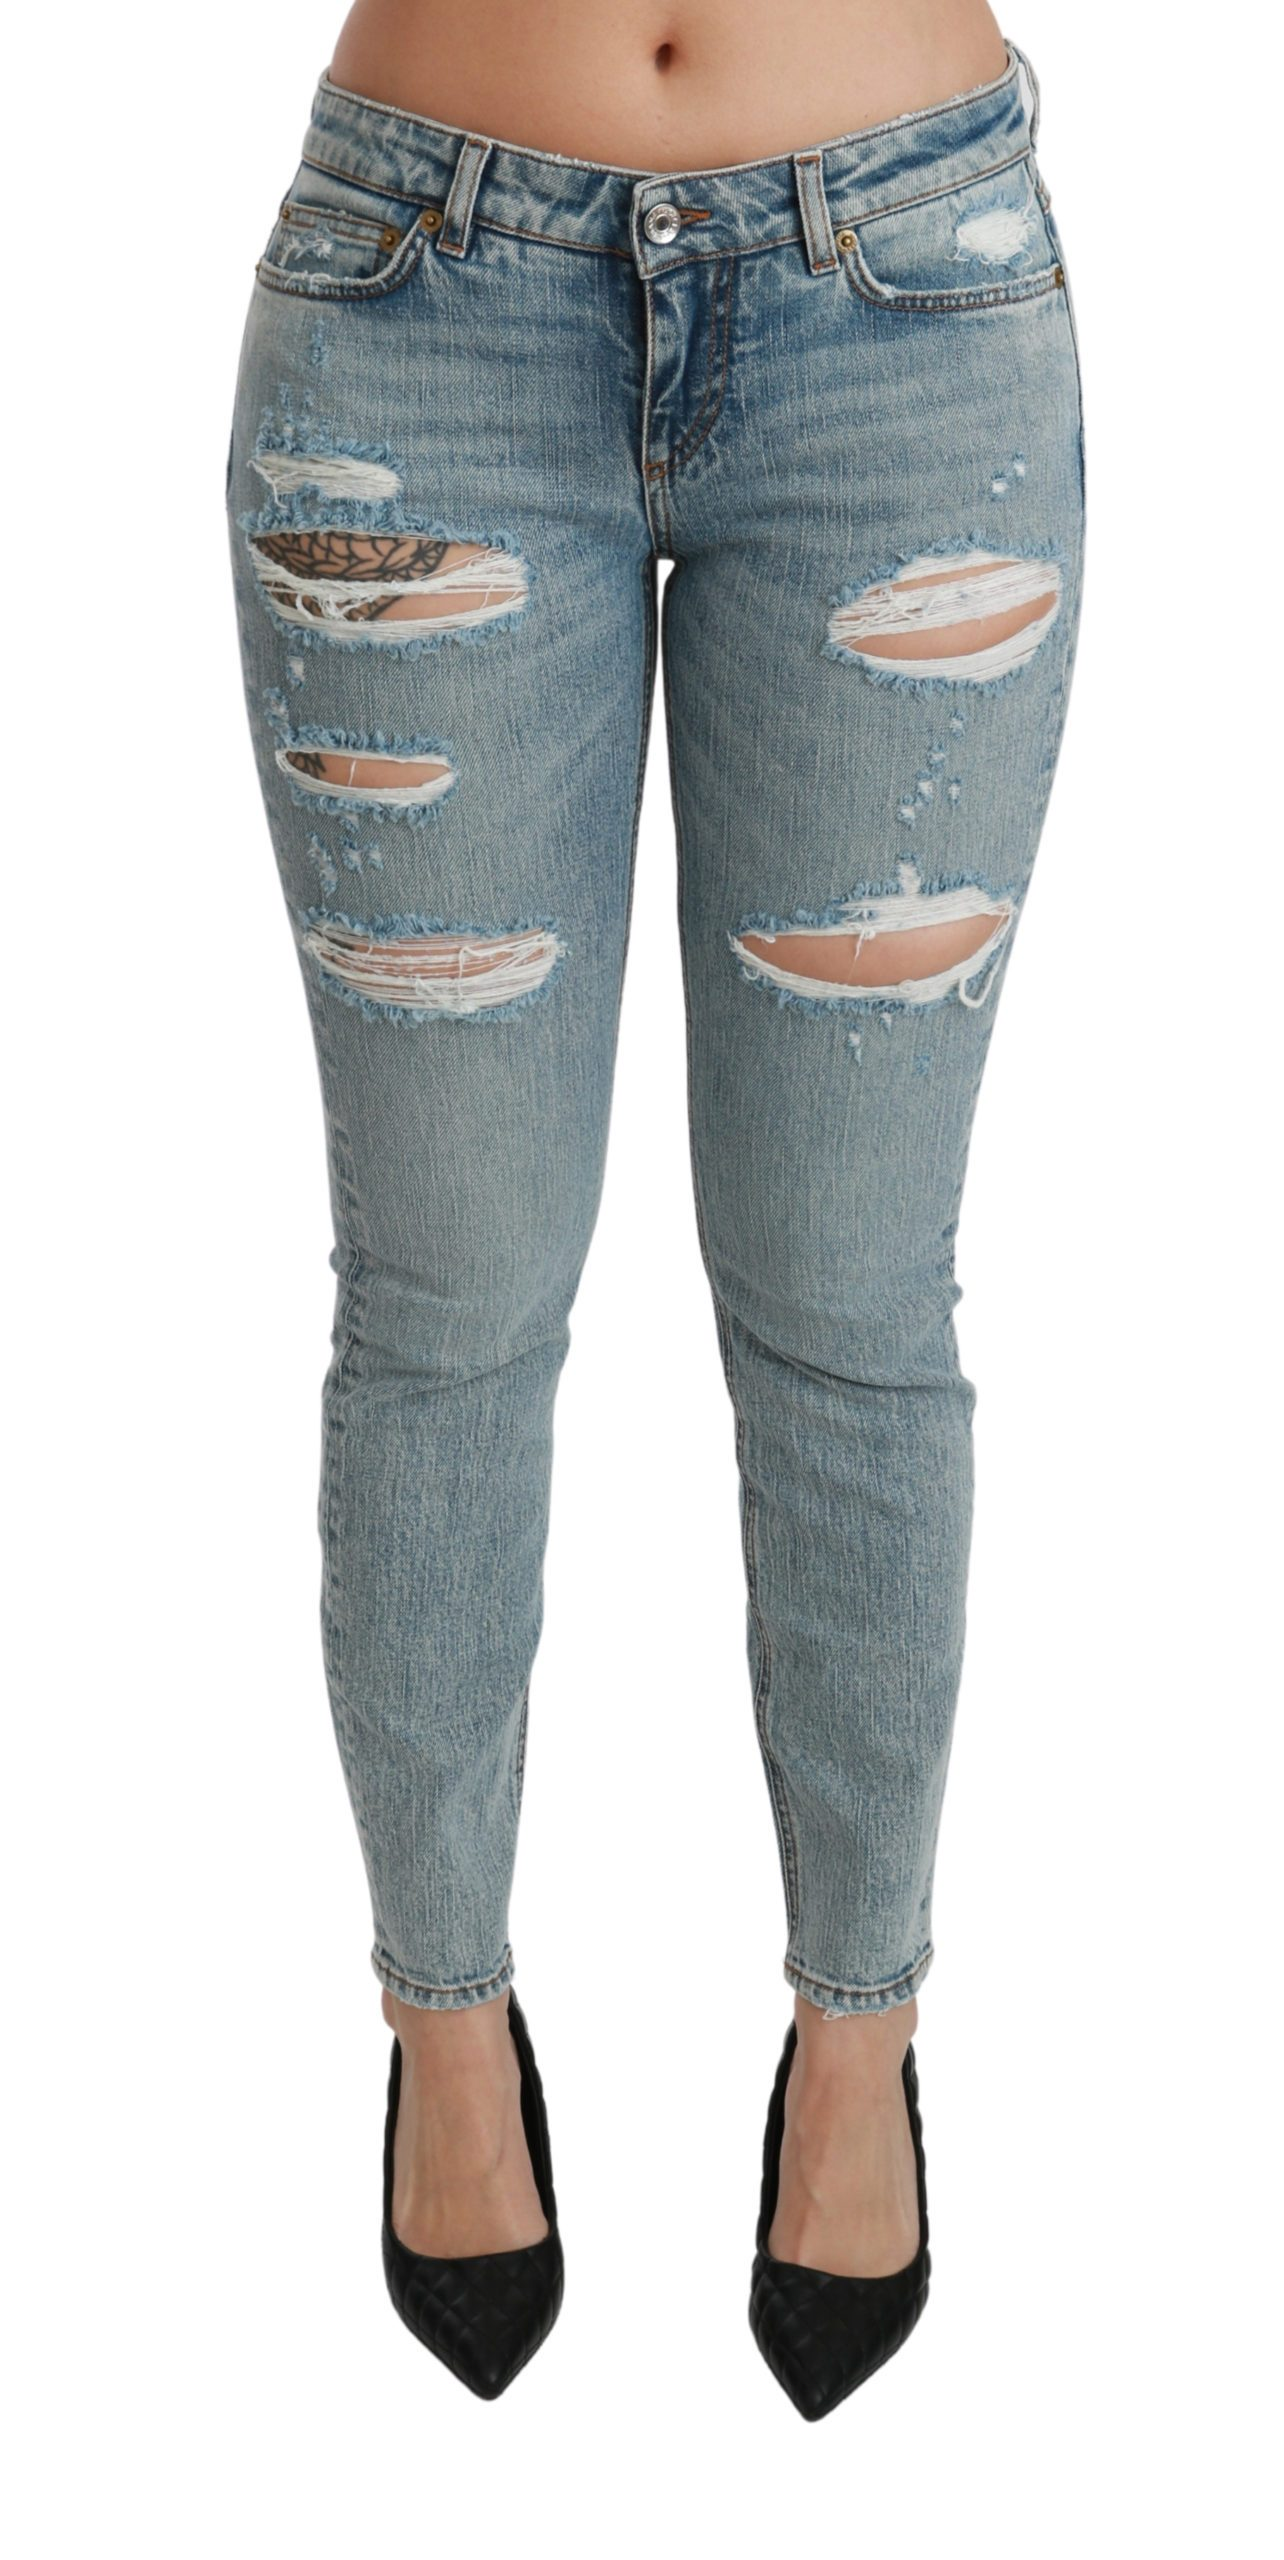 Dolce & Gabbana Women's Stretch Skinny Low Waist Cotton Jeans Blue PAN70889 - IT40|S